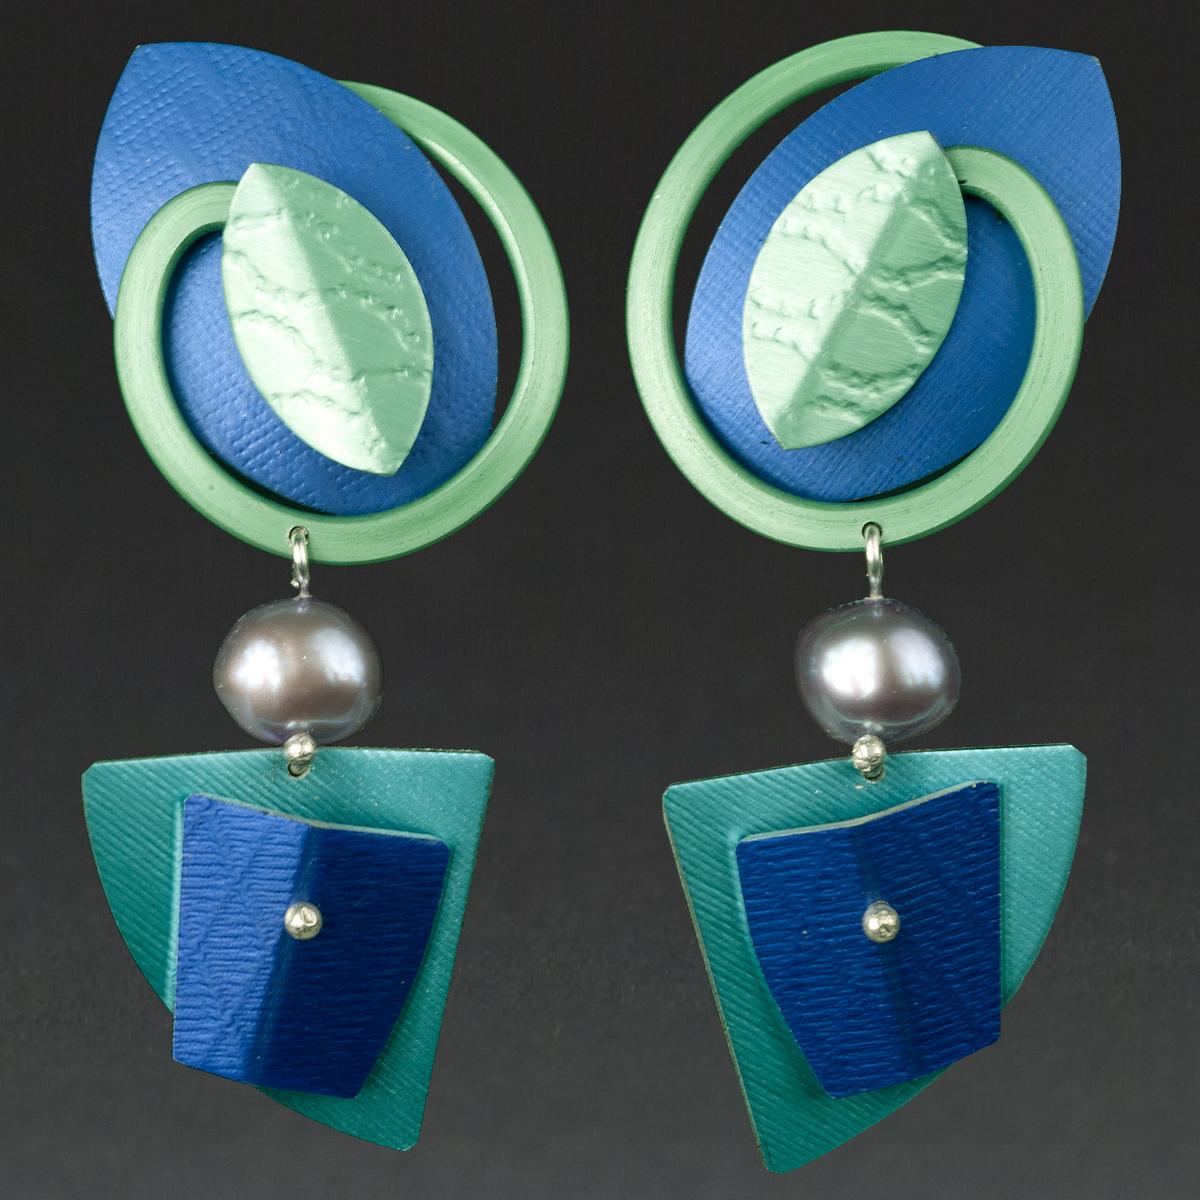 Royal, Lime, Turquoise